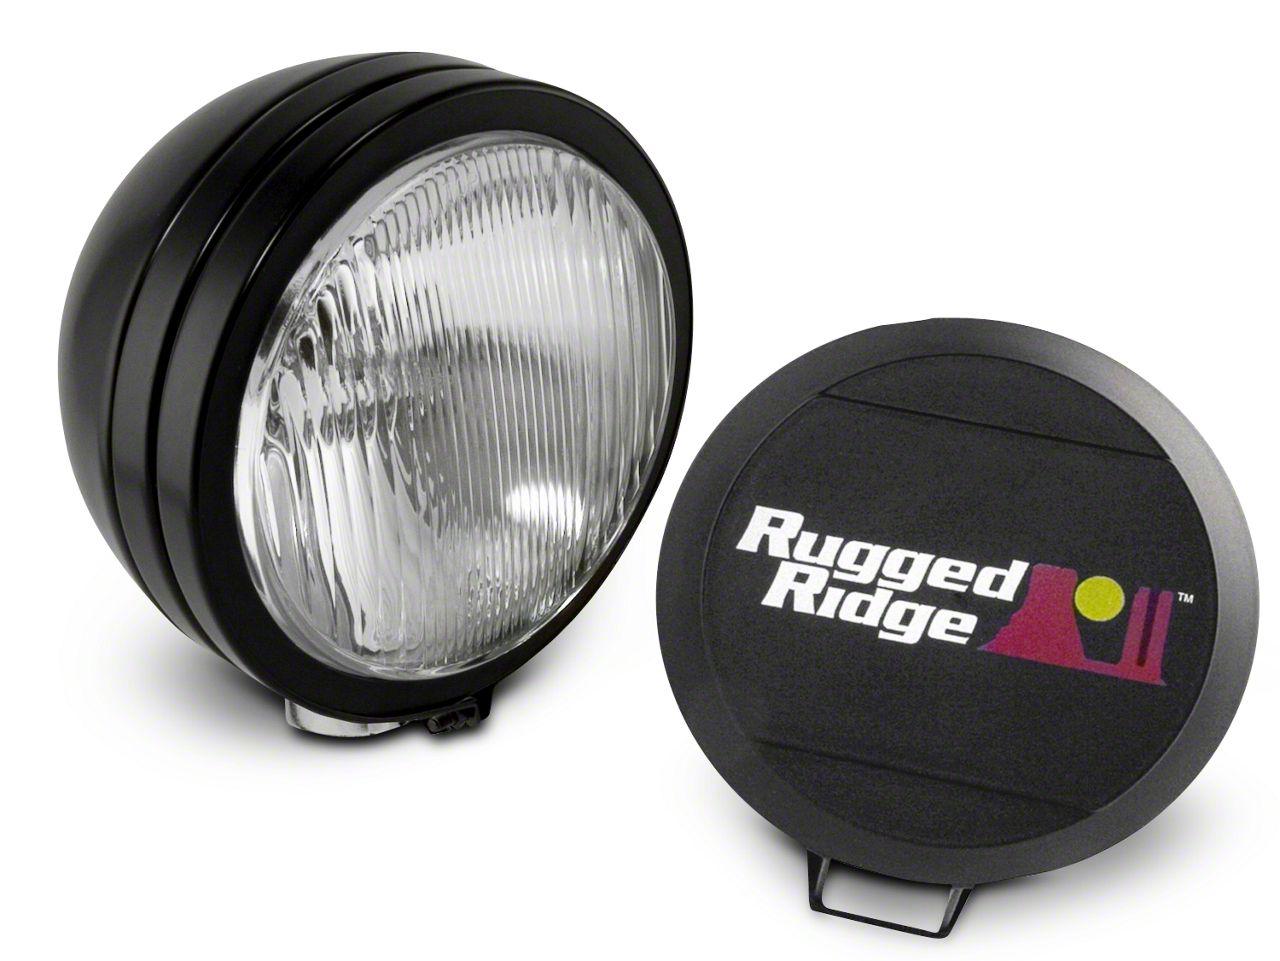 Rugged Ridge 5 in. Round HID Off-Road Fog Light w/ Black Steel Housing - Single (07-18 Sierra 1500)